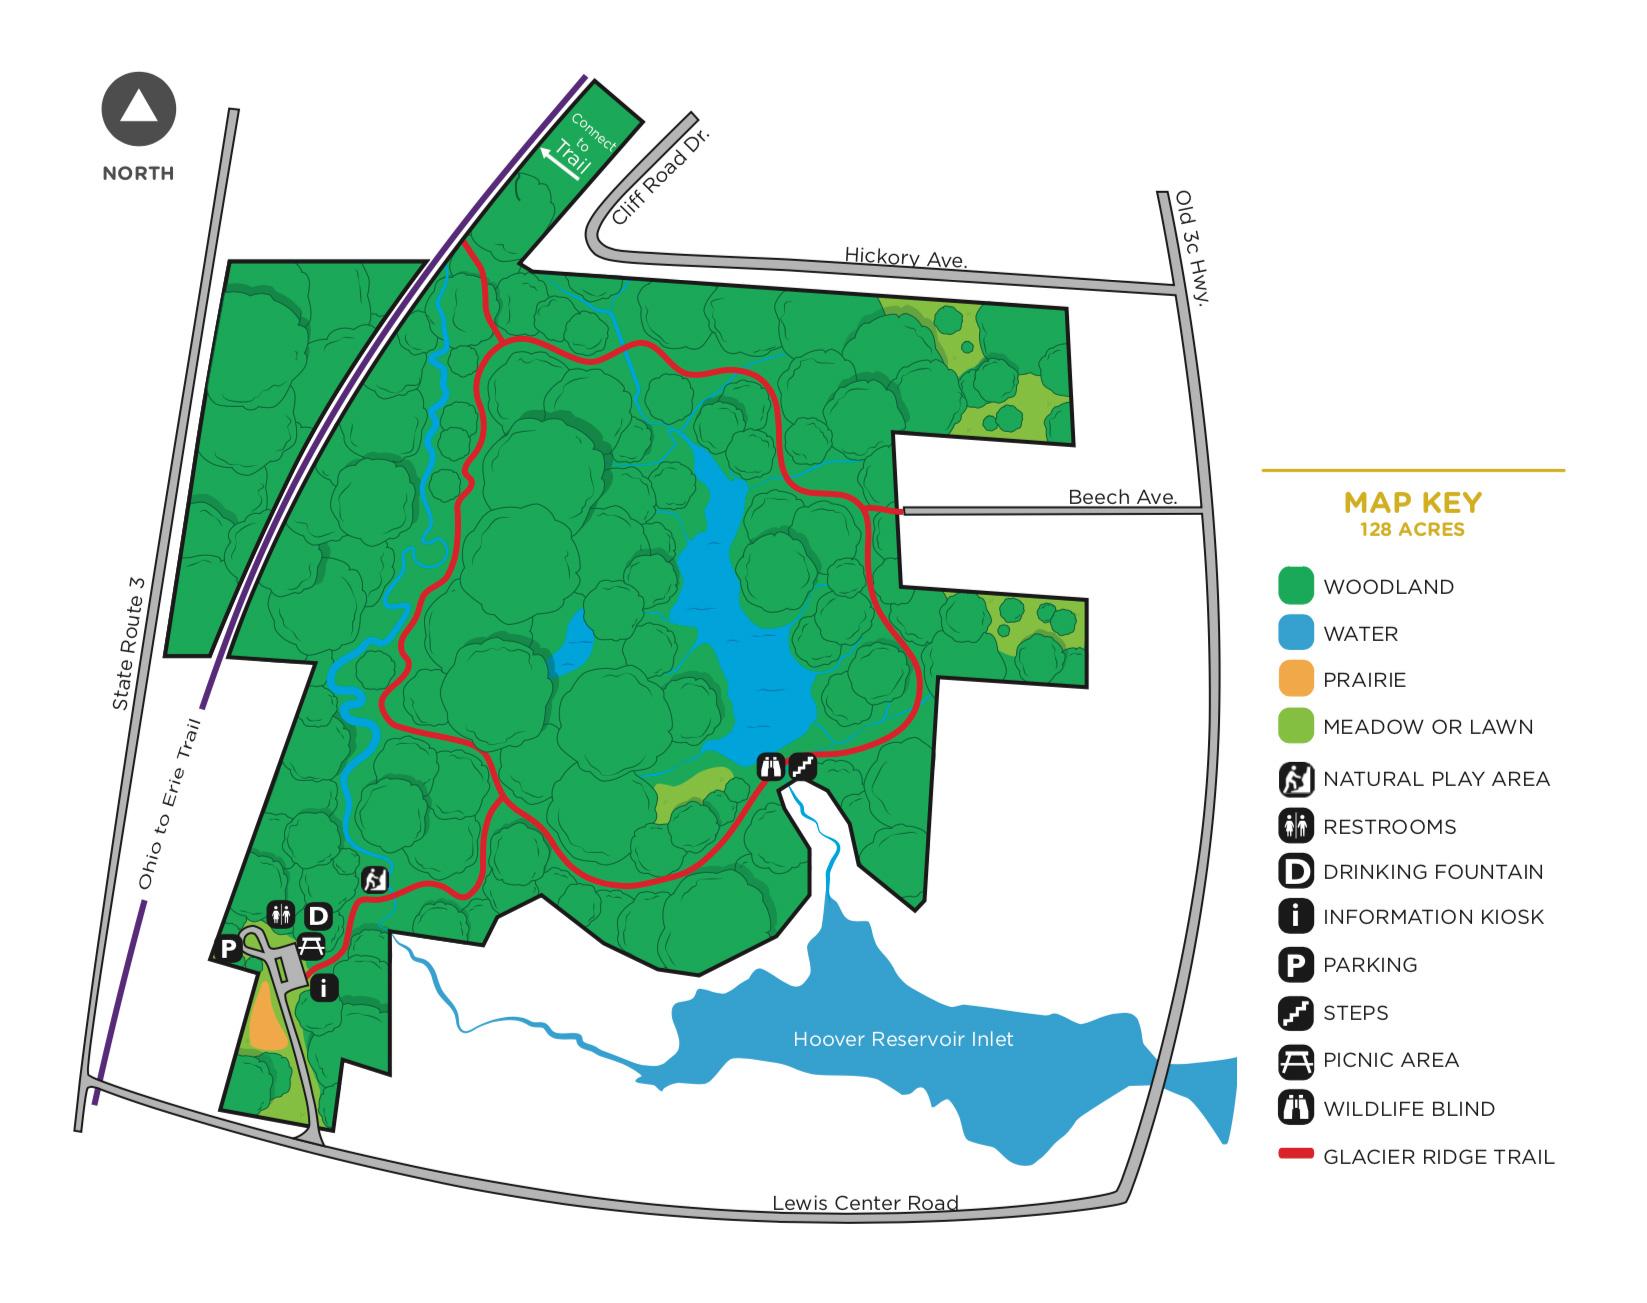 char-mar-ridge-map.jpg